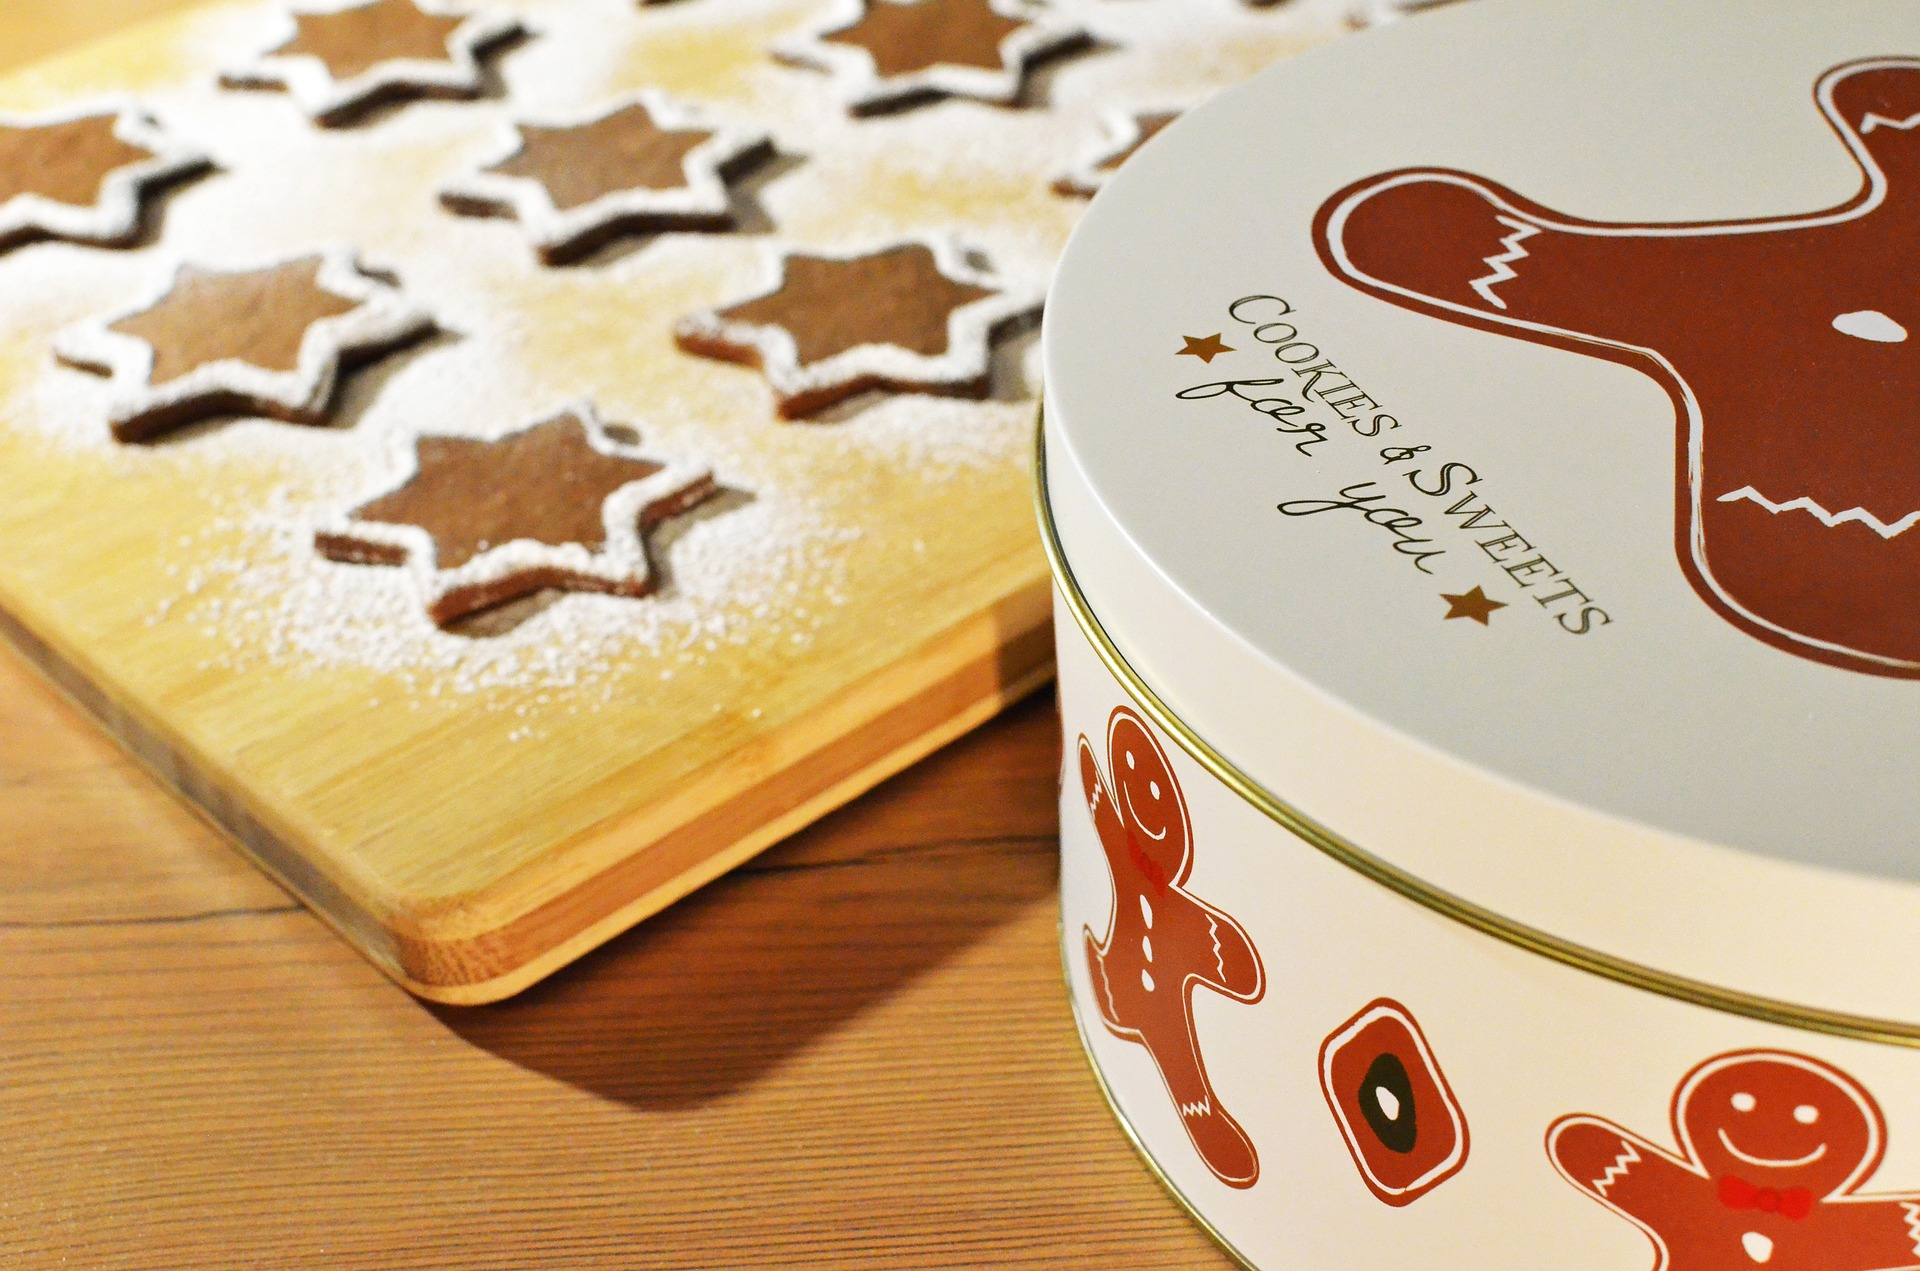 gingerbread for bake sale